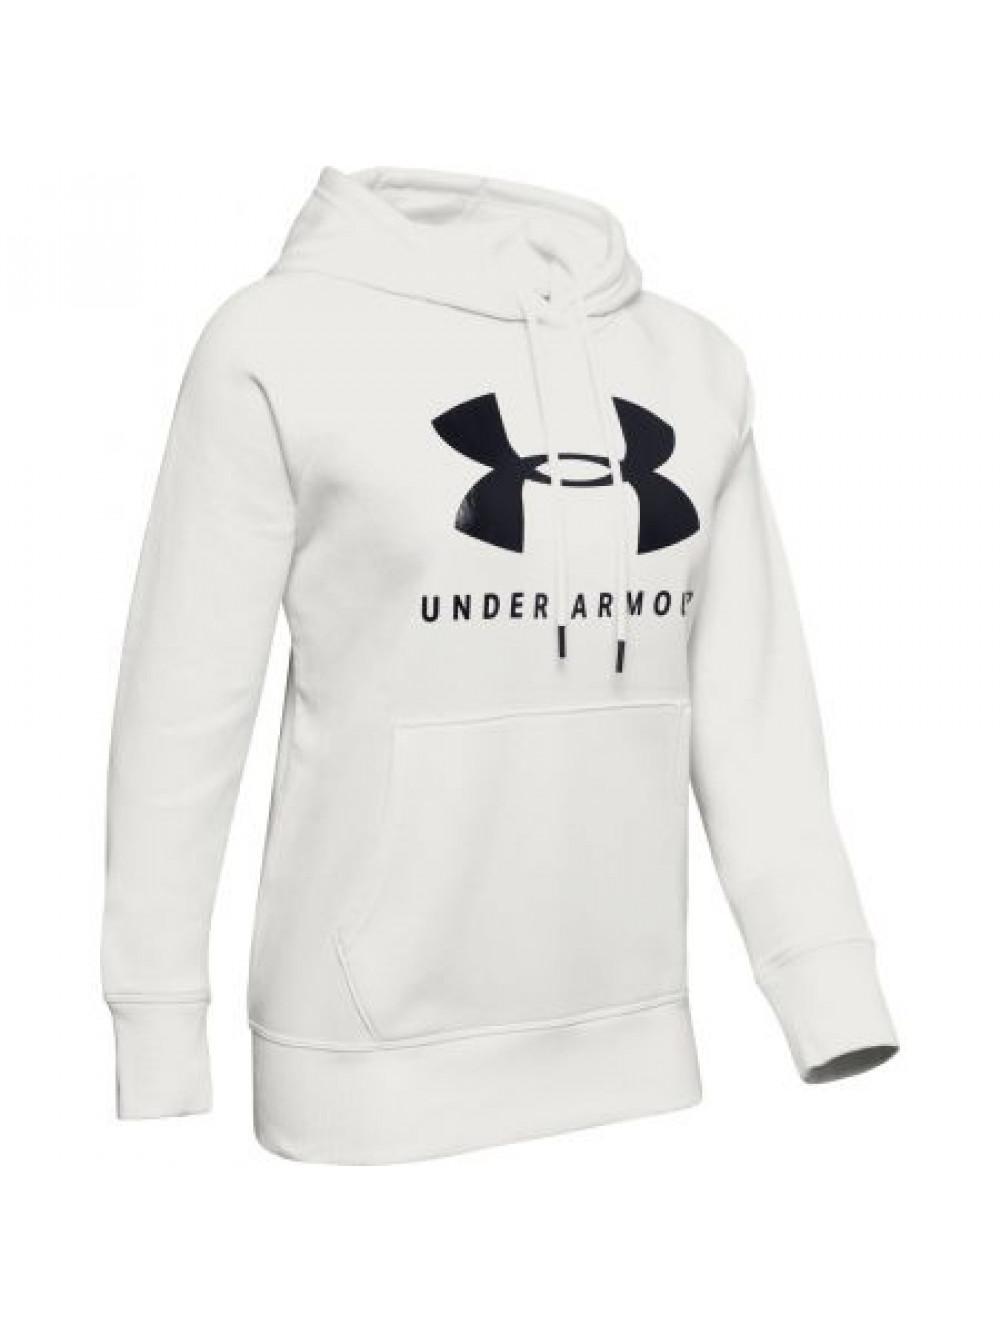 Női pulóver Under Armour Rival Fleece Sportstyle Graphic Hoodie fehér